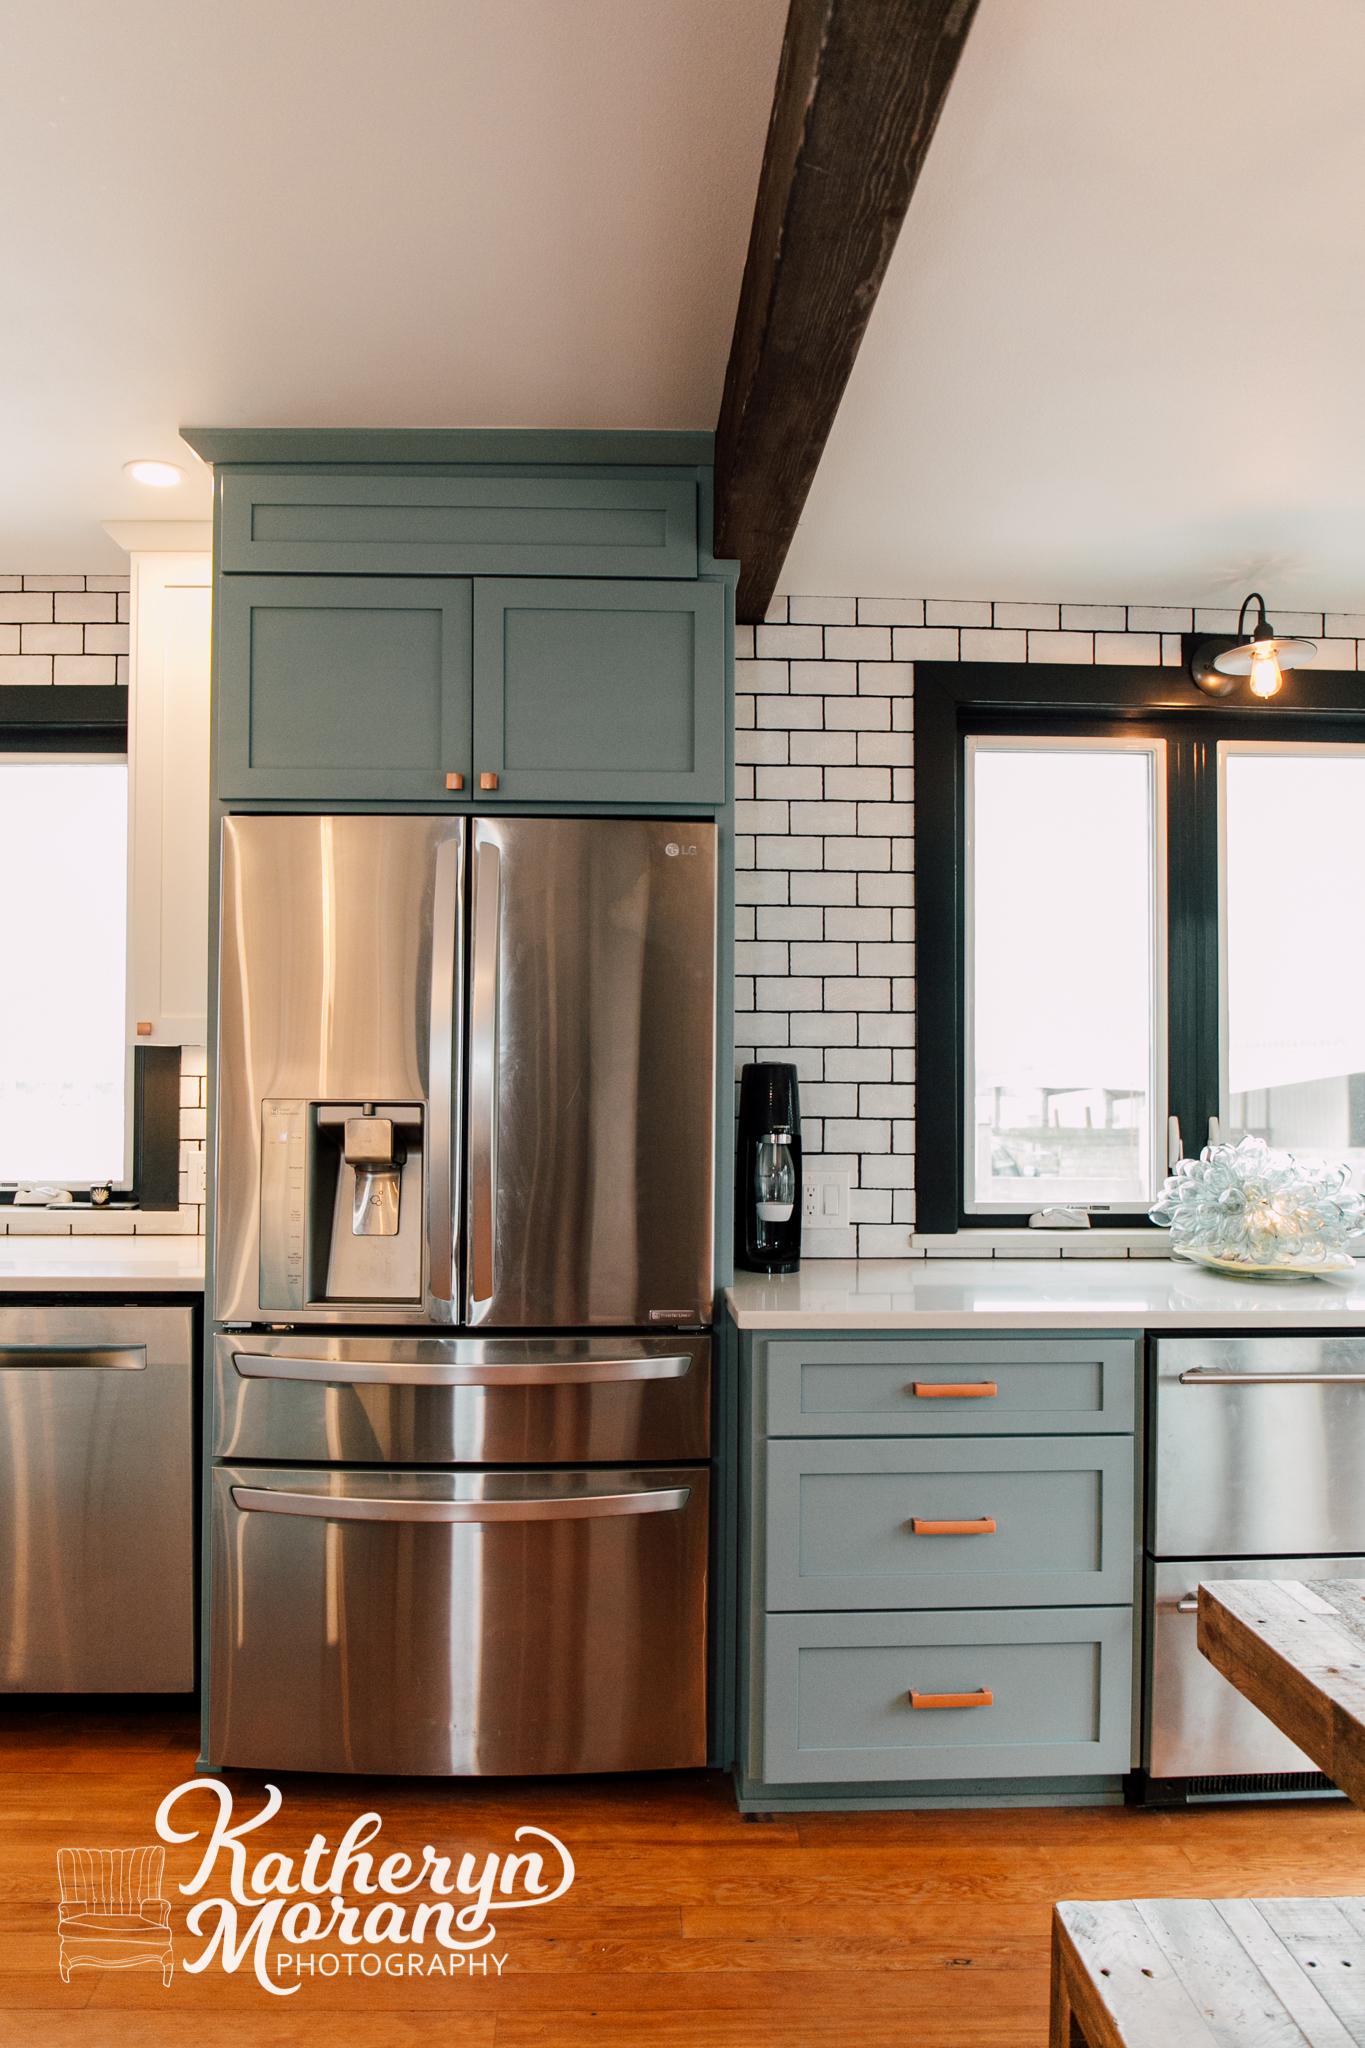 bellingham-photographer-katheryn-moran-jennifer-ryan-designs-interior-design-ferndale-kitchen-2019-1-4.jpg